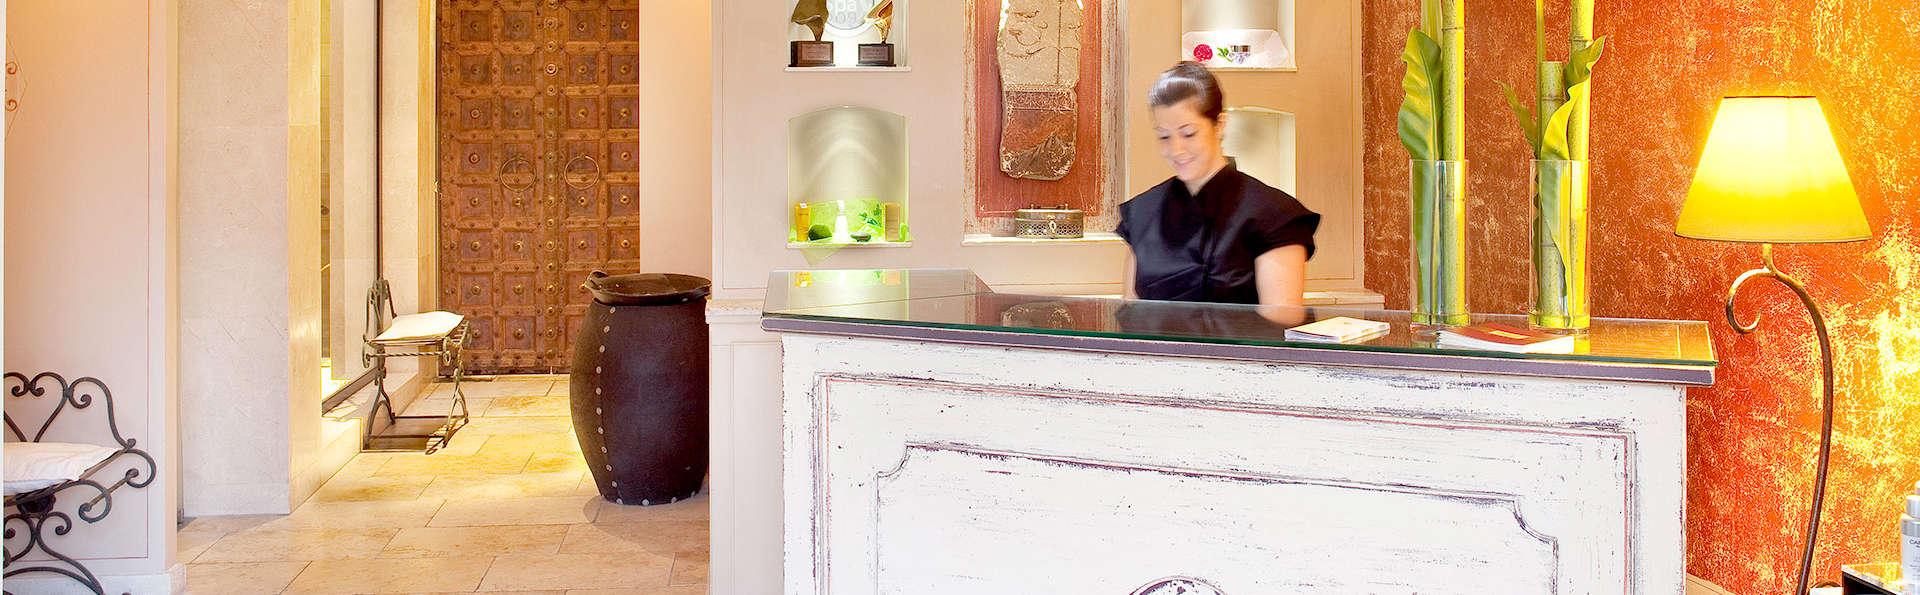 Boutique Hôtel - Hostellerie Bérard & spa  - Edit_Reception.jpg